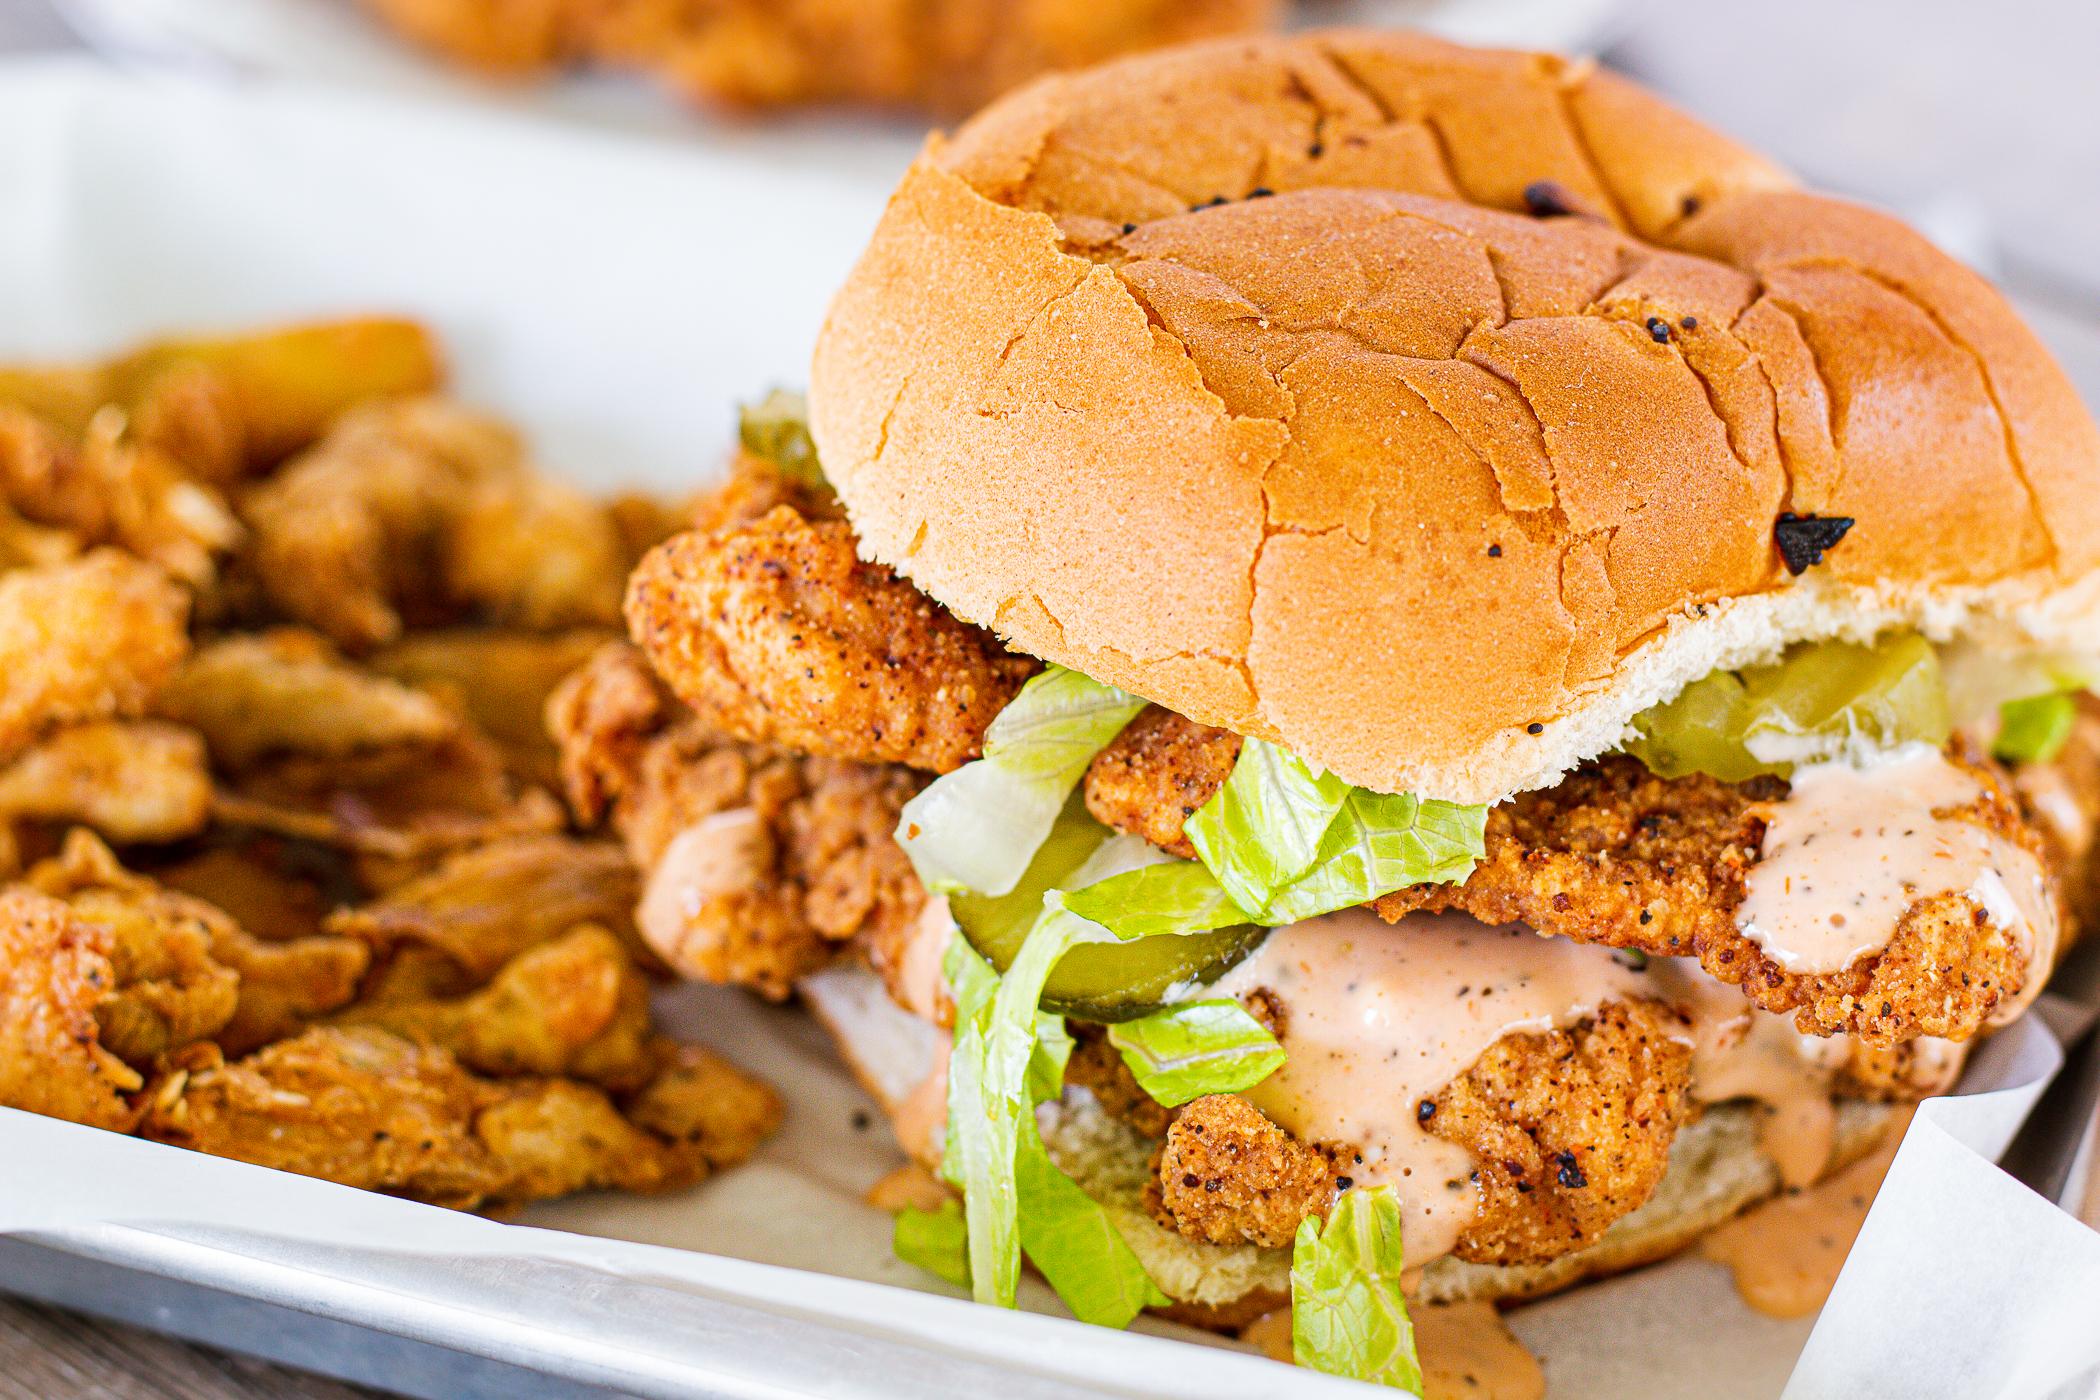 Fried pork tenderloin sandwich is not the healthiest, but it sure is delicious!